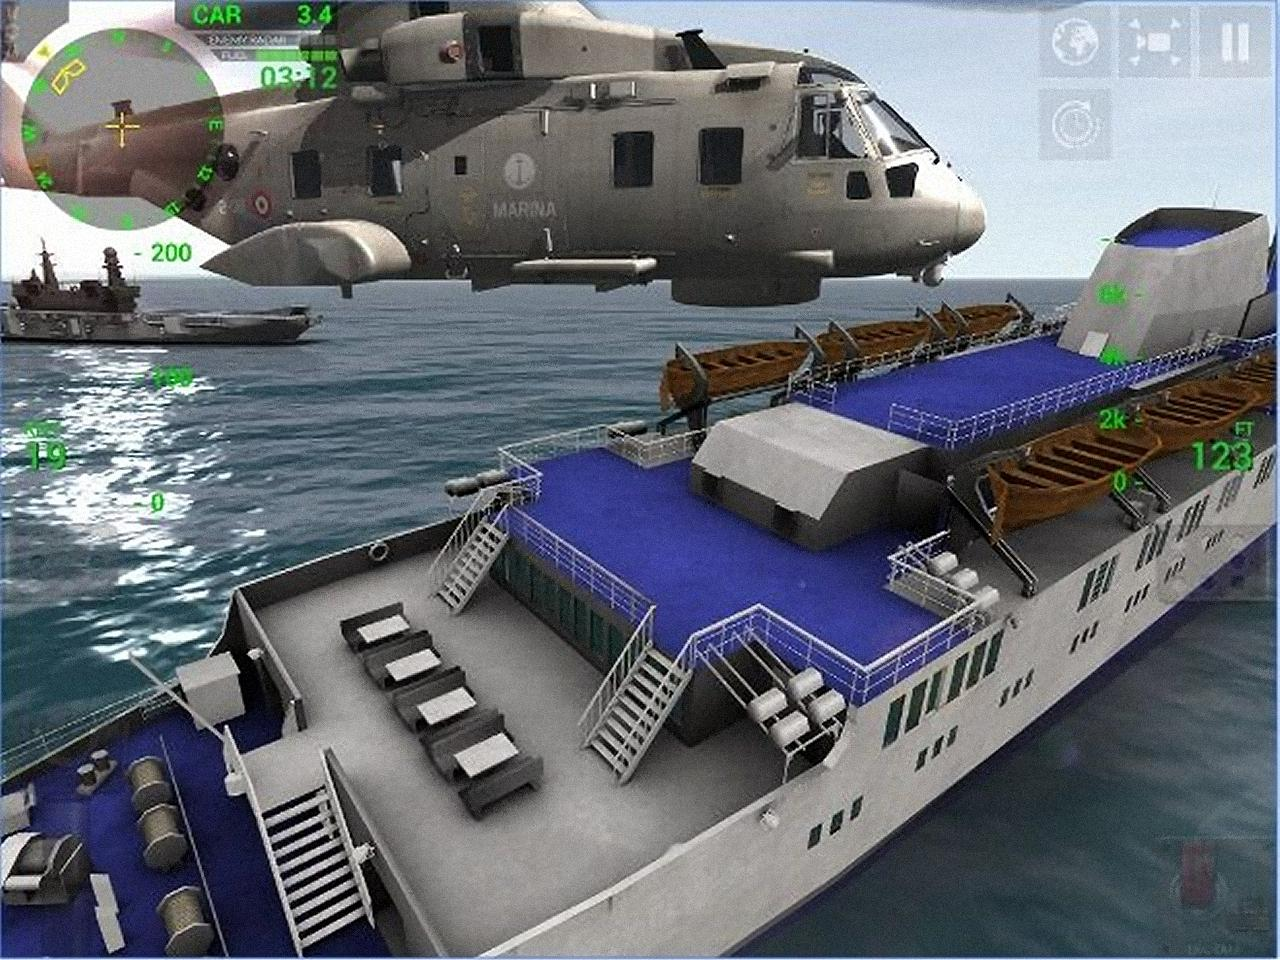 Marina Militare - Italian Navy Sim Android iOS PC immagine 14